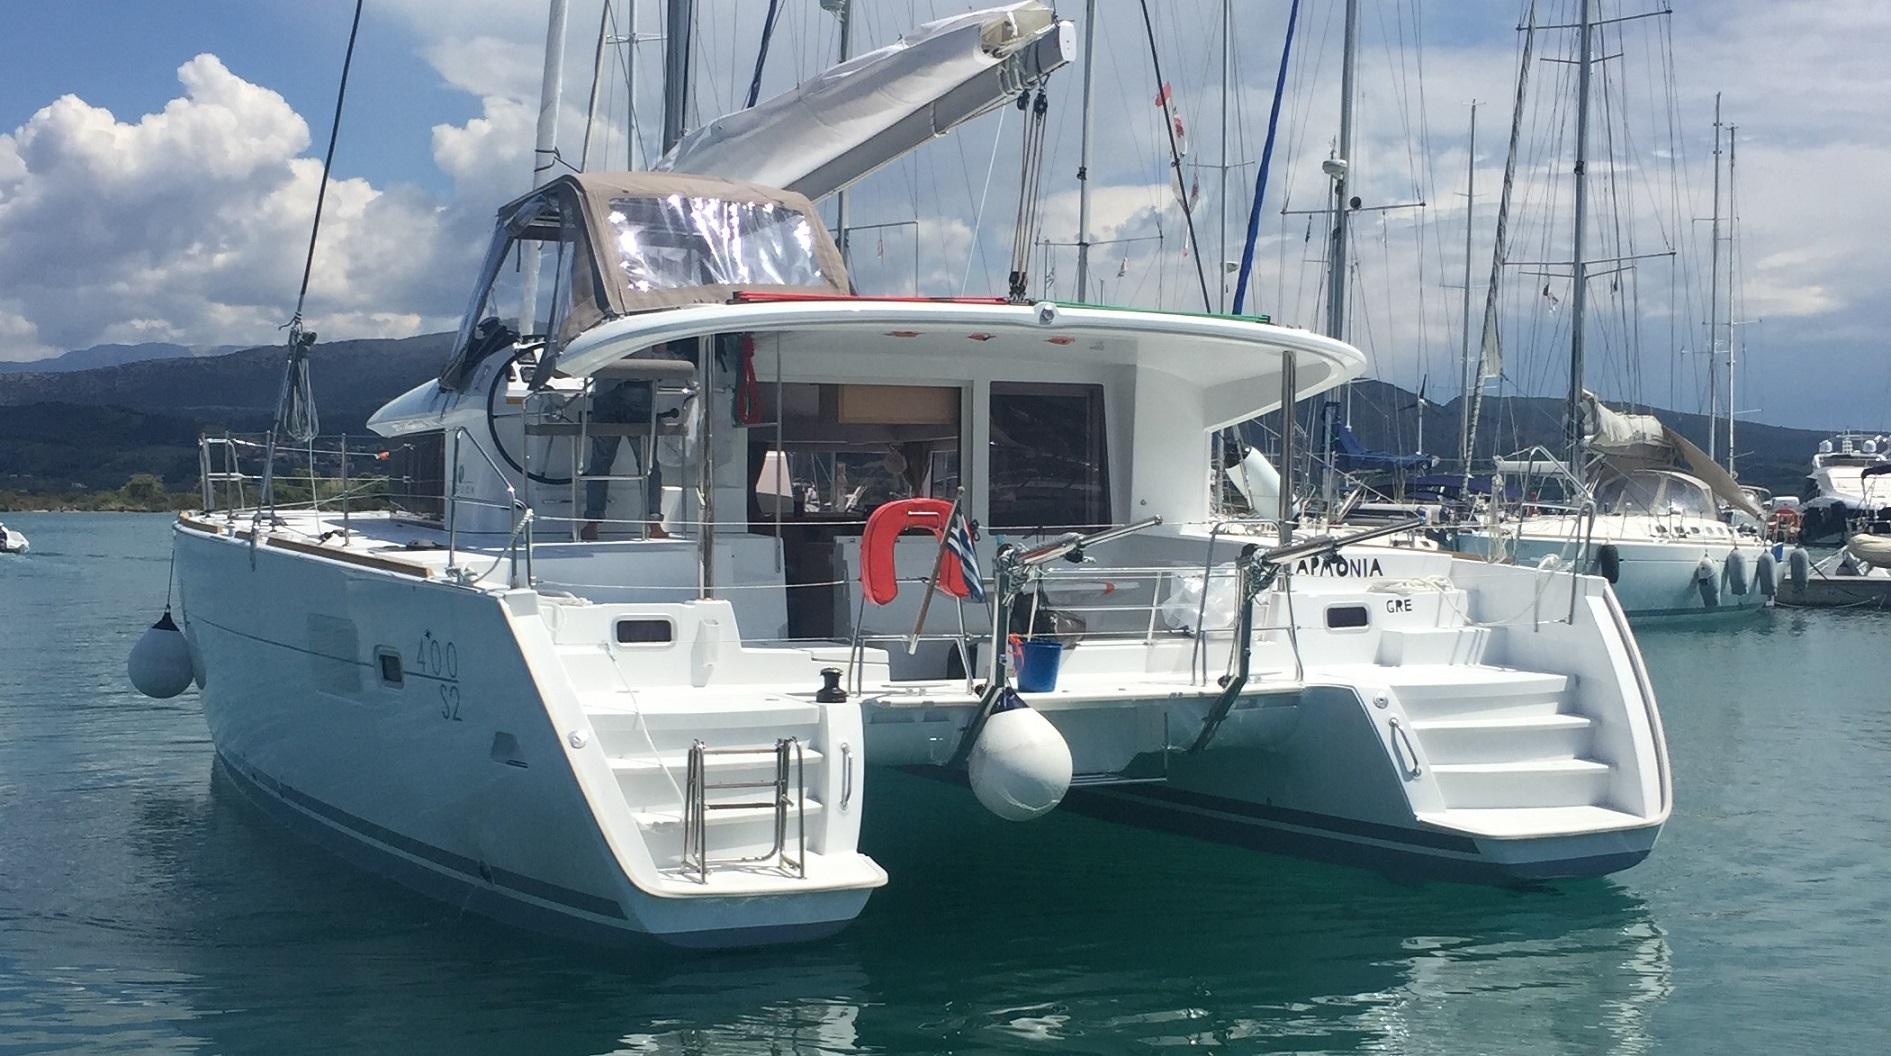 Greece, Lefkada. Catamaran Lagoon..